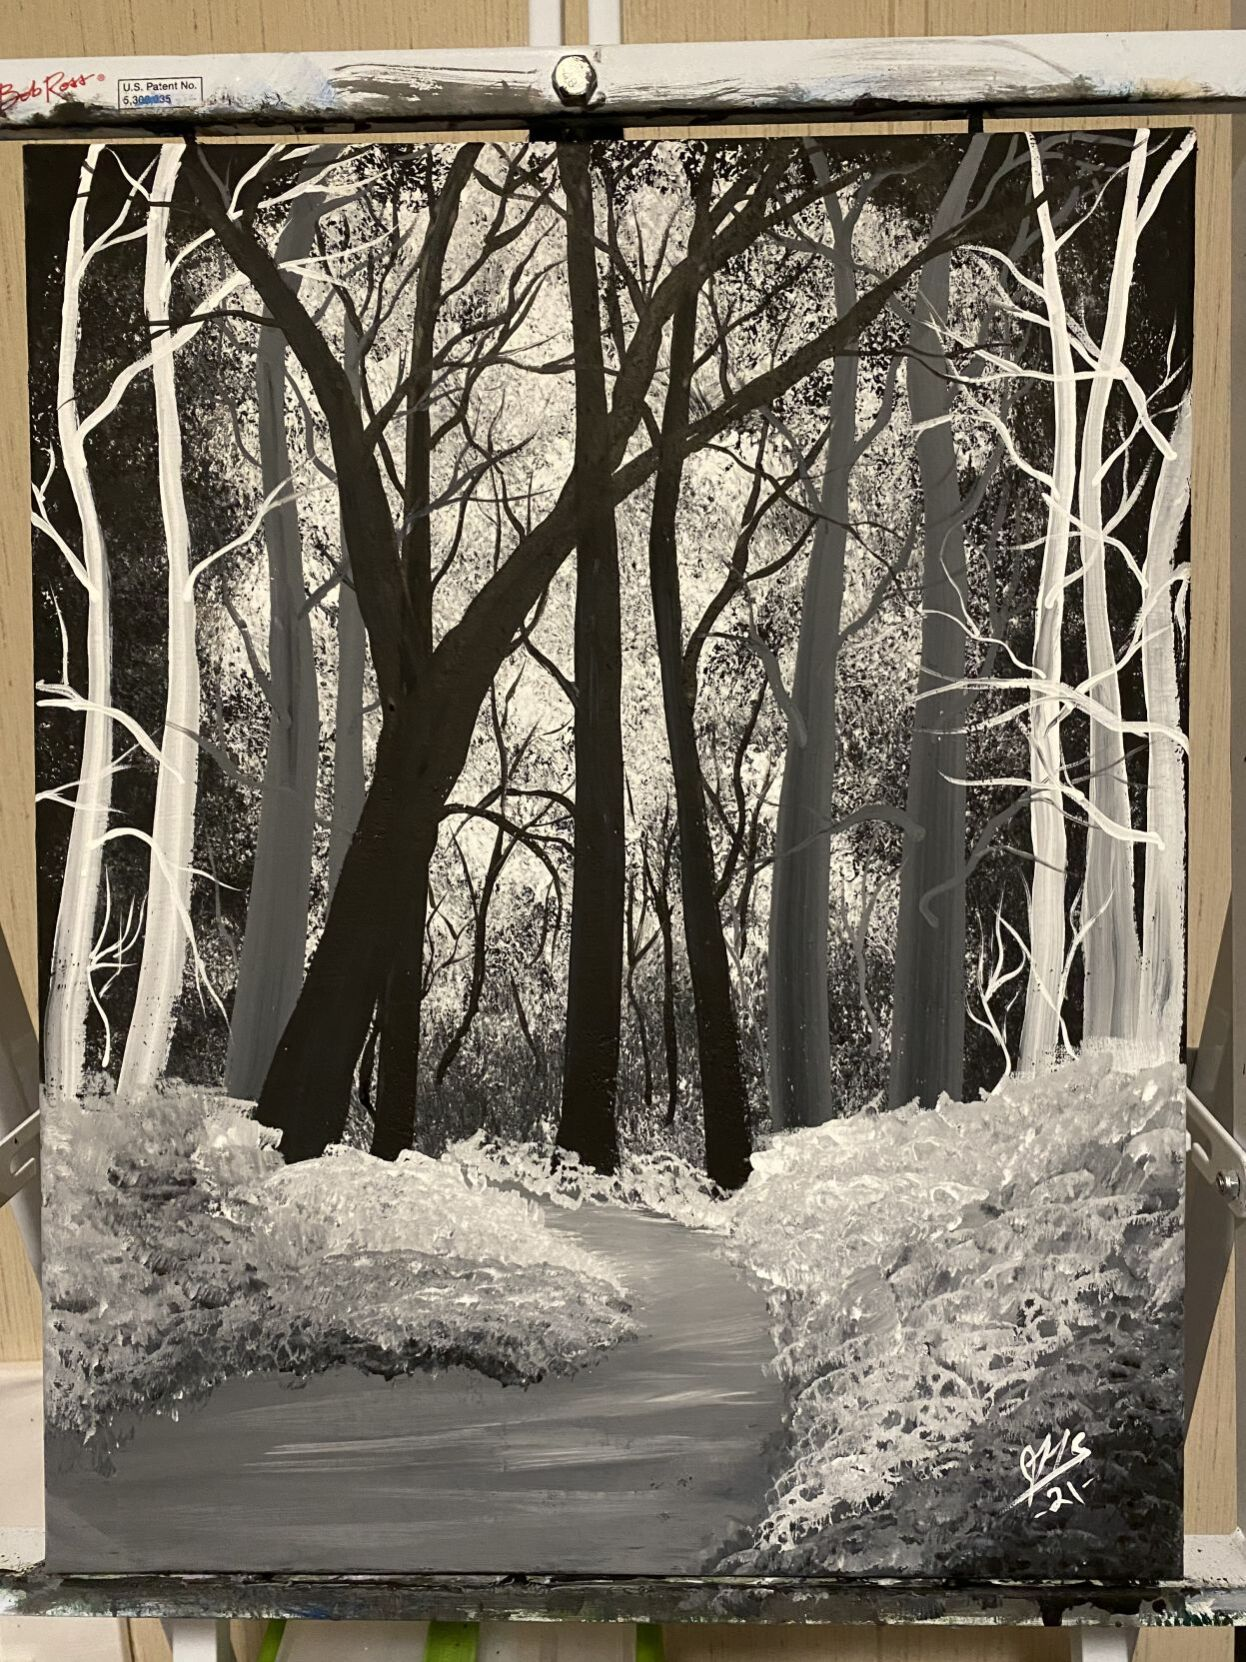 Jennette Starritt is Local Artist Gallery Artist of the Month